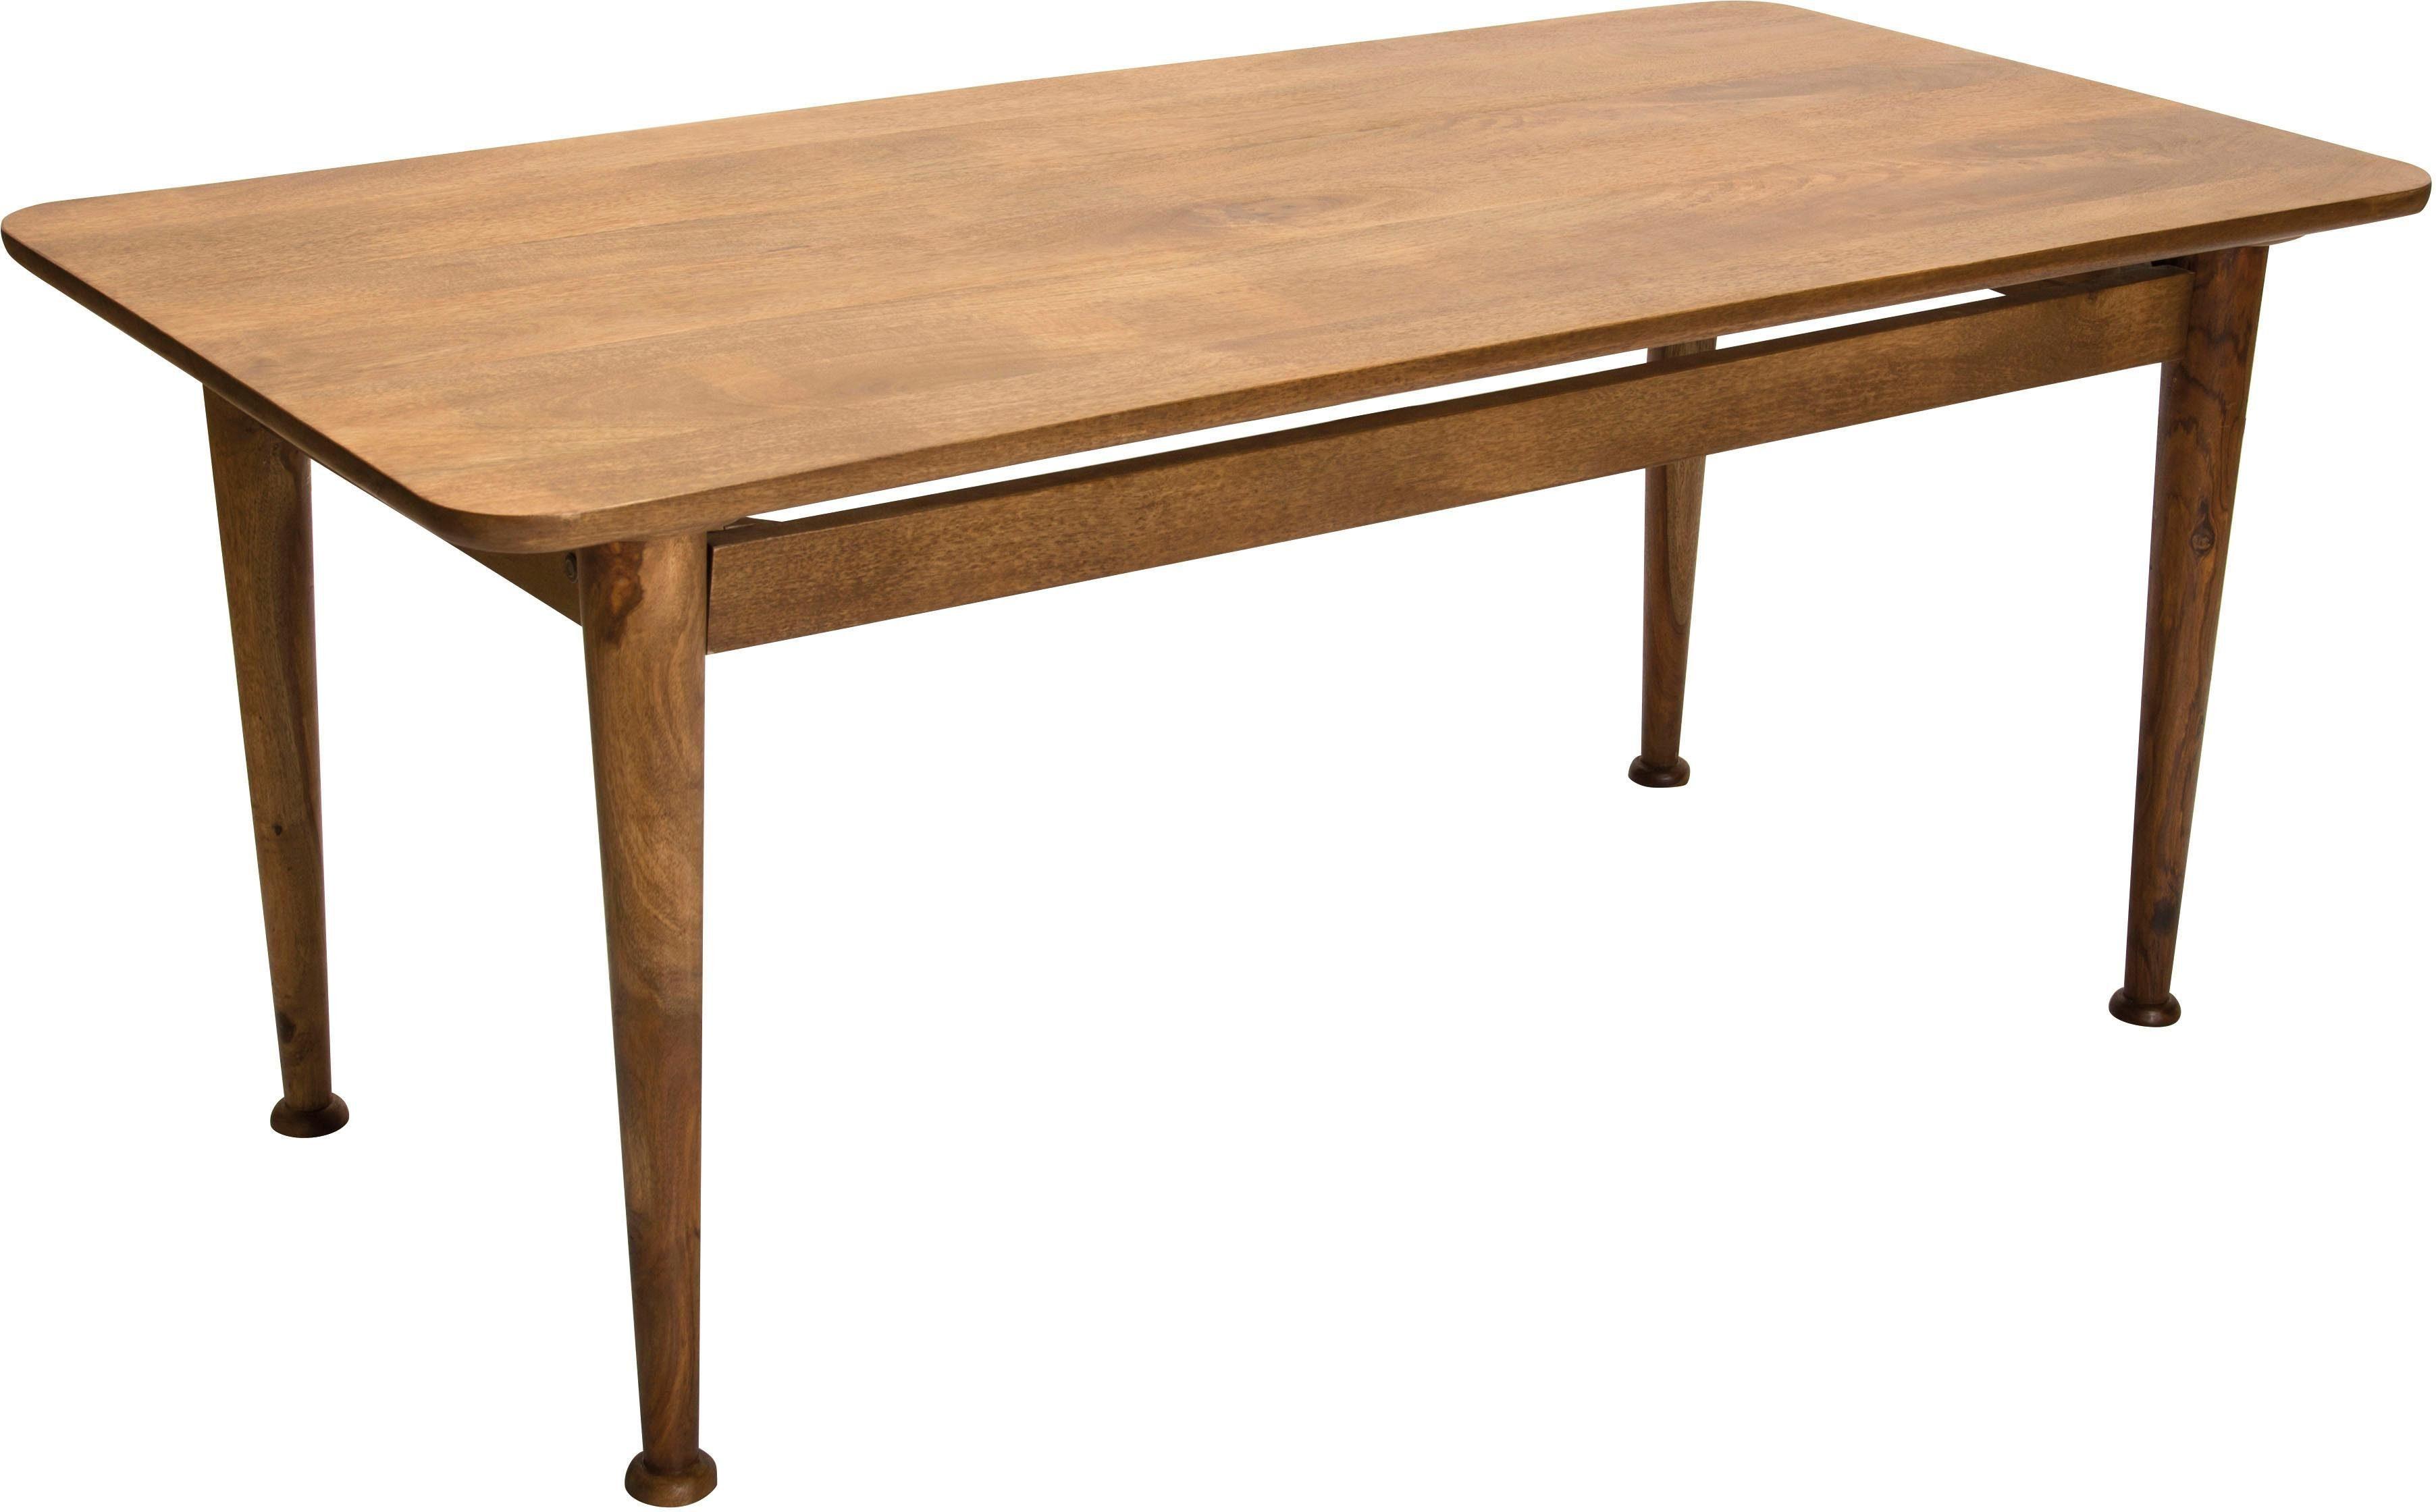 TOM TAILOR Esstisch »T-WESTCOAST TABLE LARGE« aus Mangoholz, Breite 180 cm